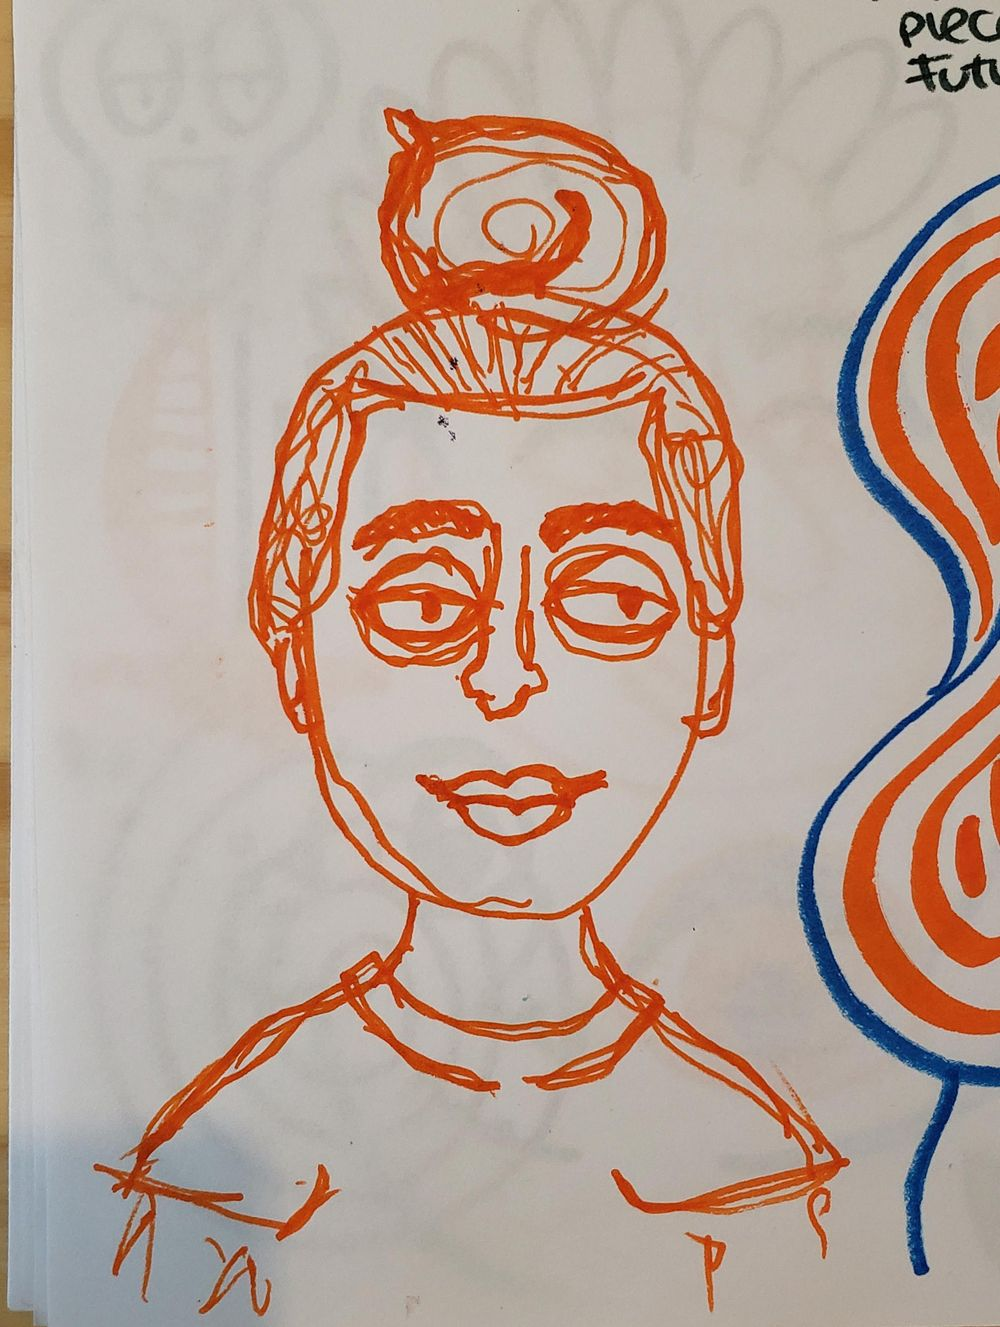 Mariana Ortega - image 1 - student project